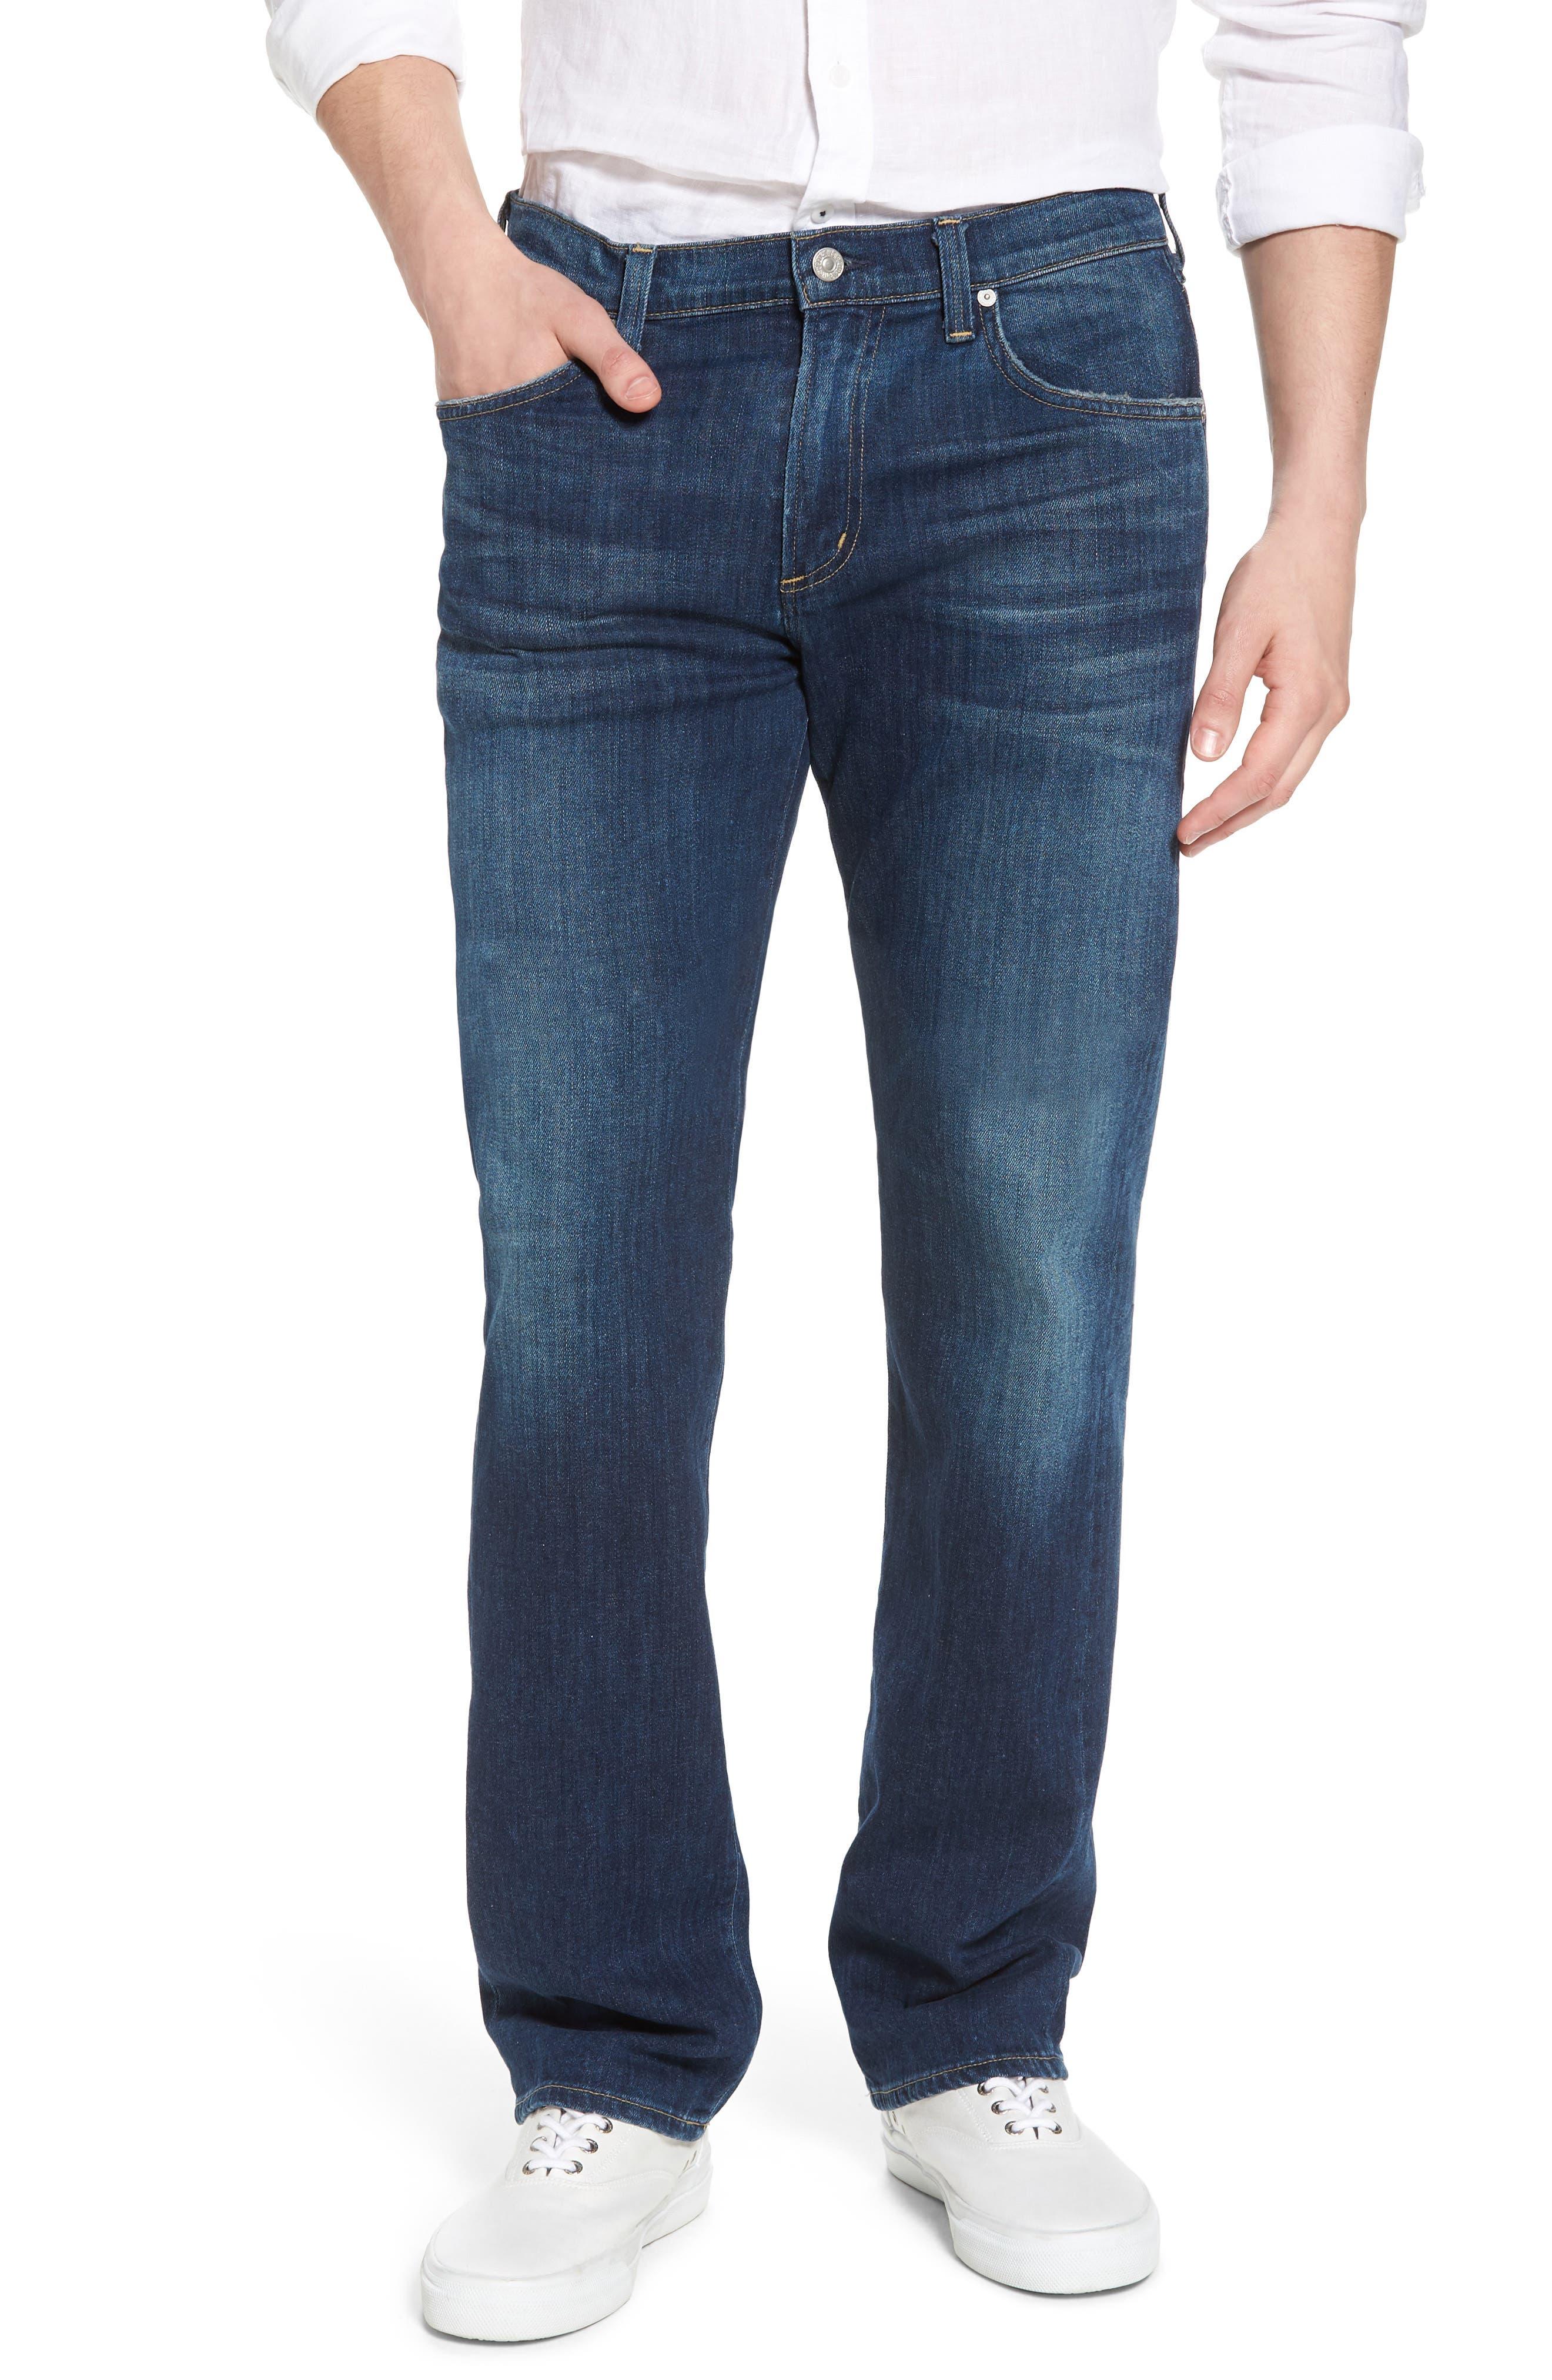 Citizens of Humanity Sid Straight Leg Jeans (Adler)